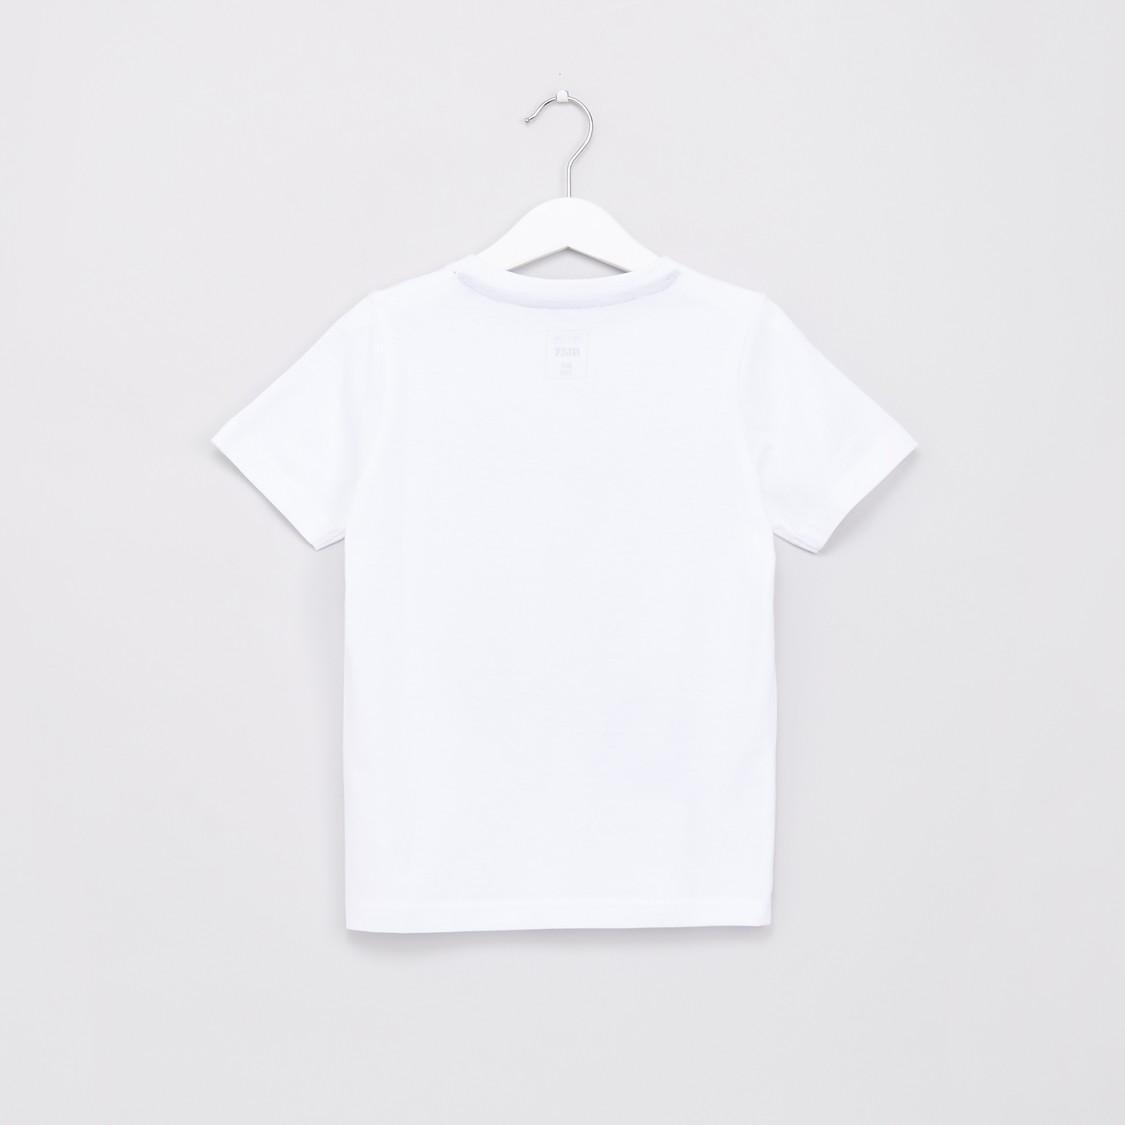 Graphic Printed Short Sleeves T-Shirt